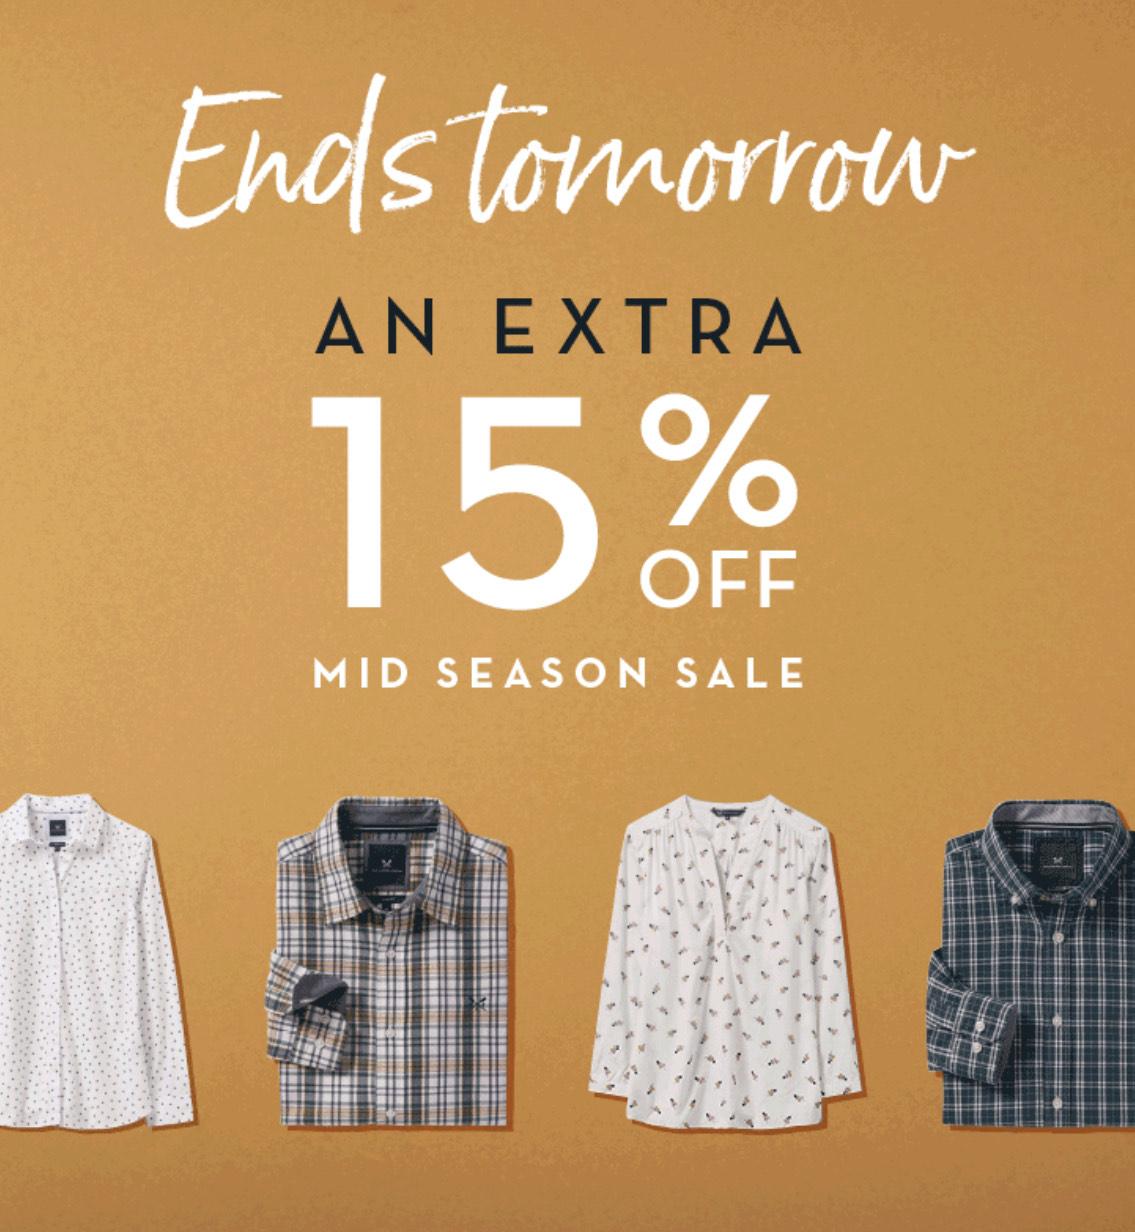 Extra 15% off Crew Clothings Mid Season Sale